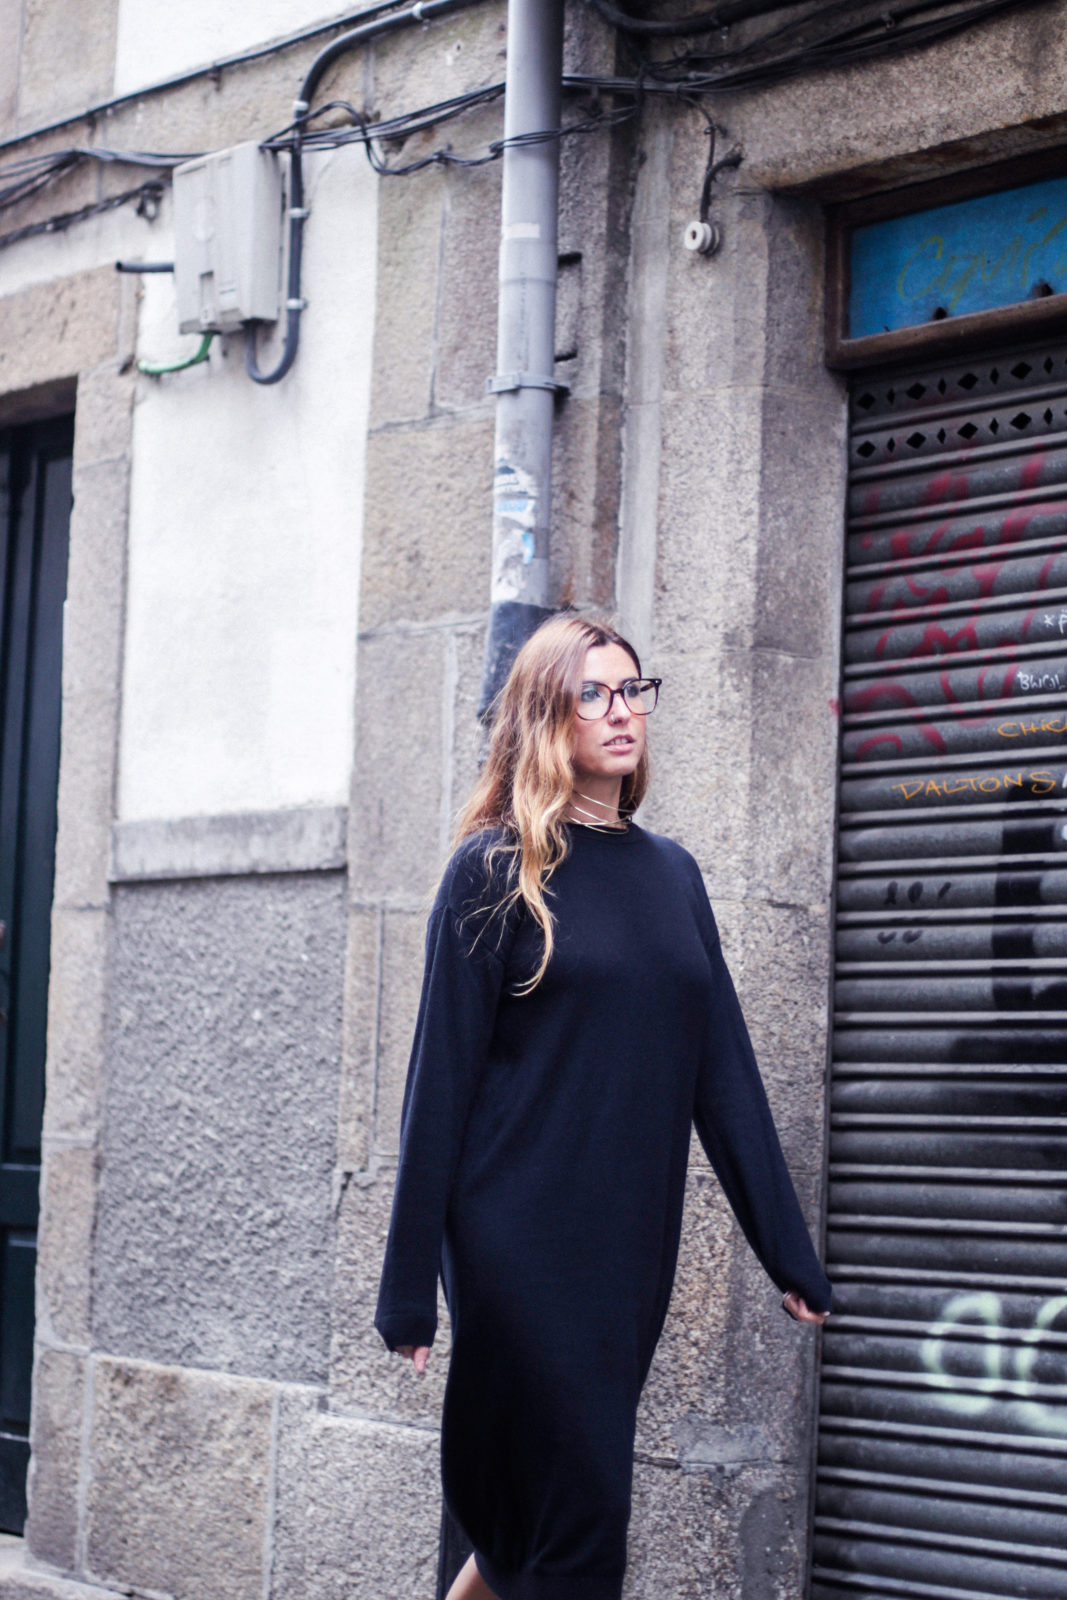 vestido_de_punto_midi_vans_calcetines_rejilla_choker_metalico_happiness_boutique_abrigo_largo_gucci_street_style_fall_2016_donkeycool-39